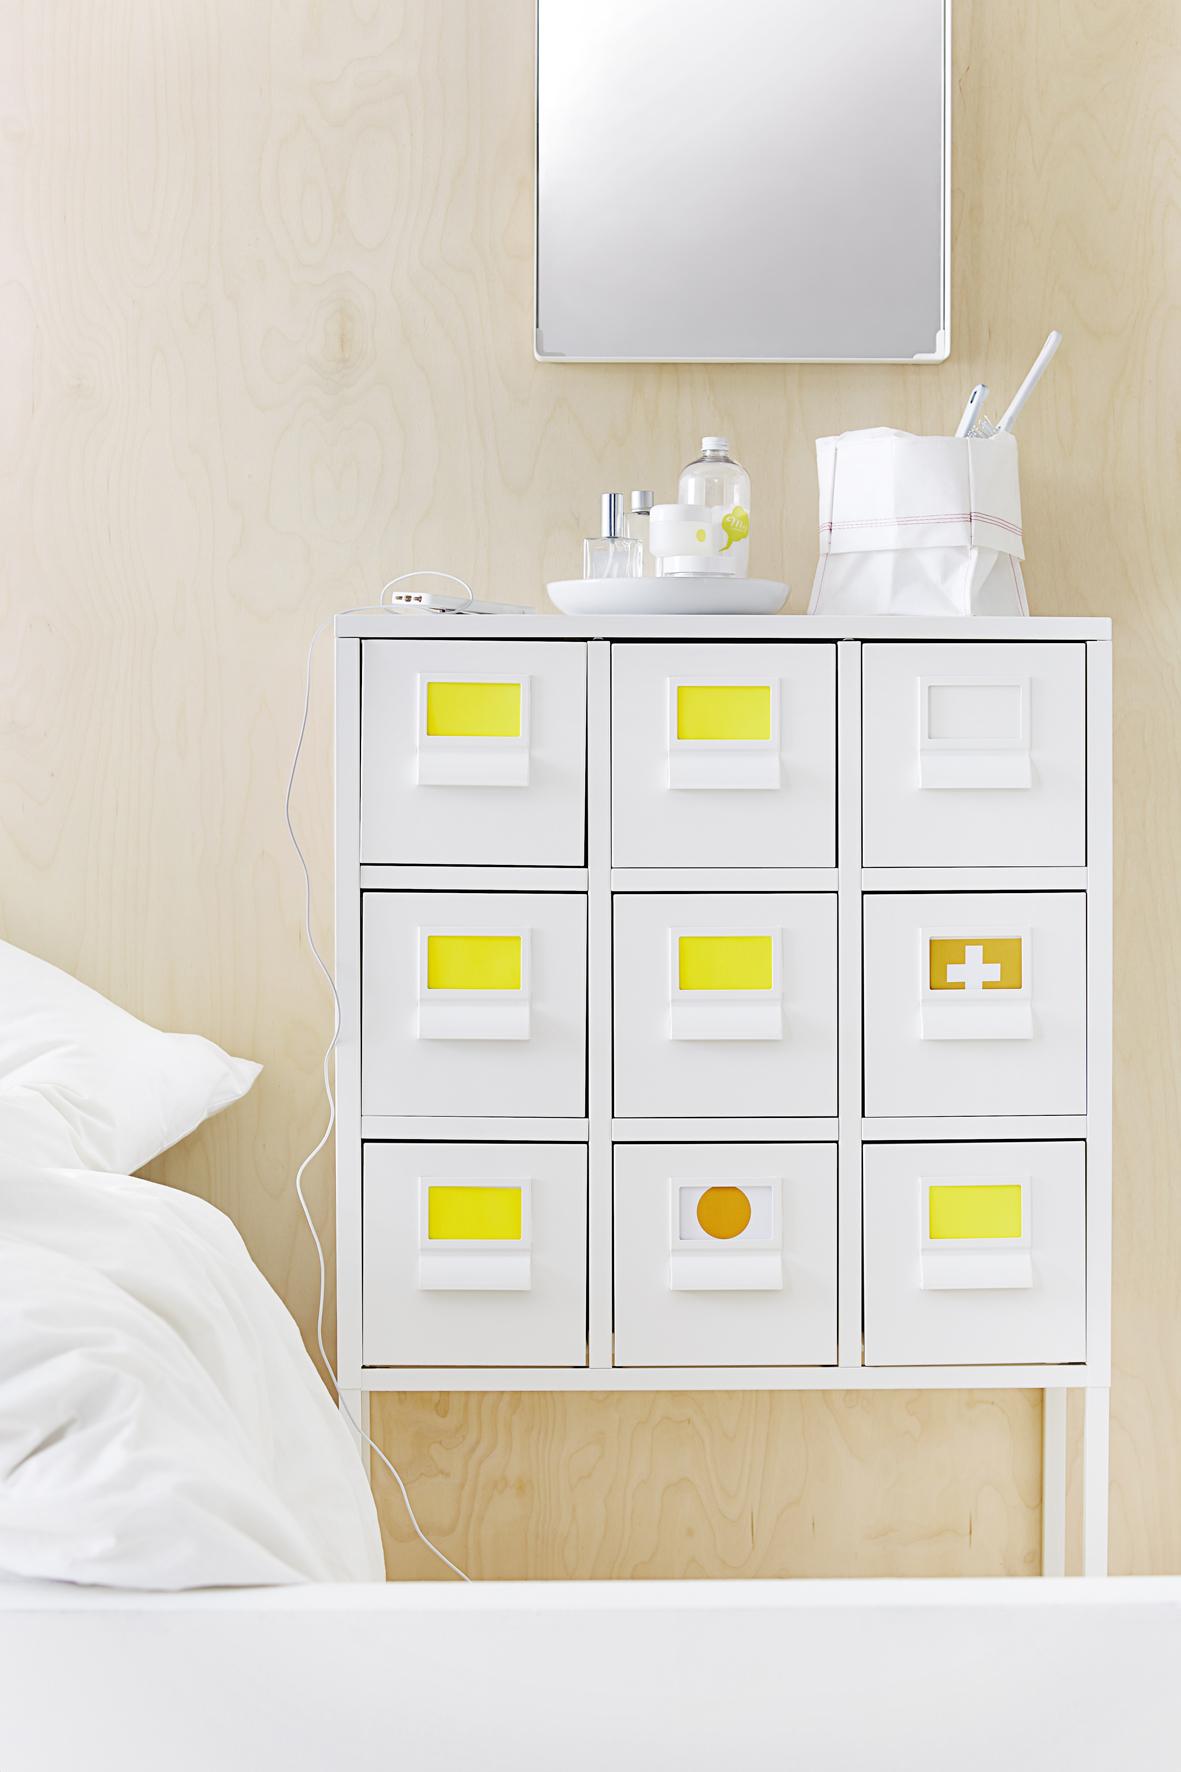 Keuken Opberg Ideeen : opberg ideeen slaapkamer : opberg idee schoenen Archieven Interieur